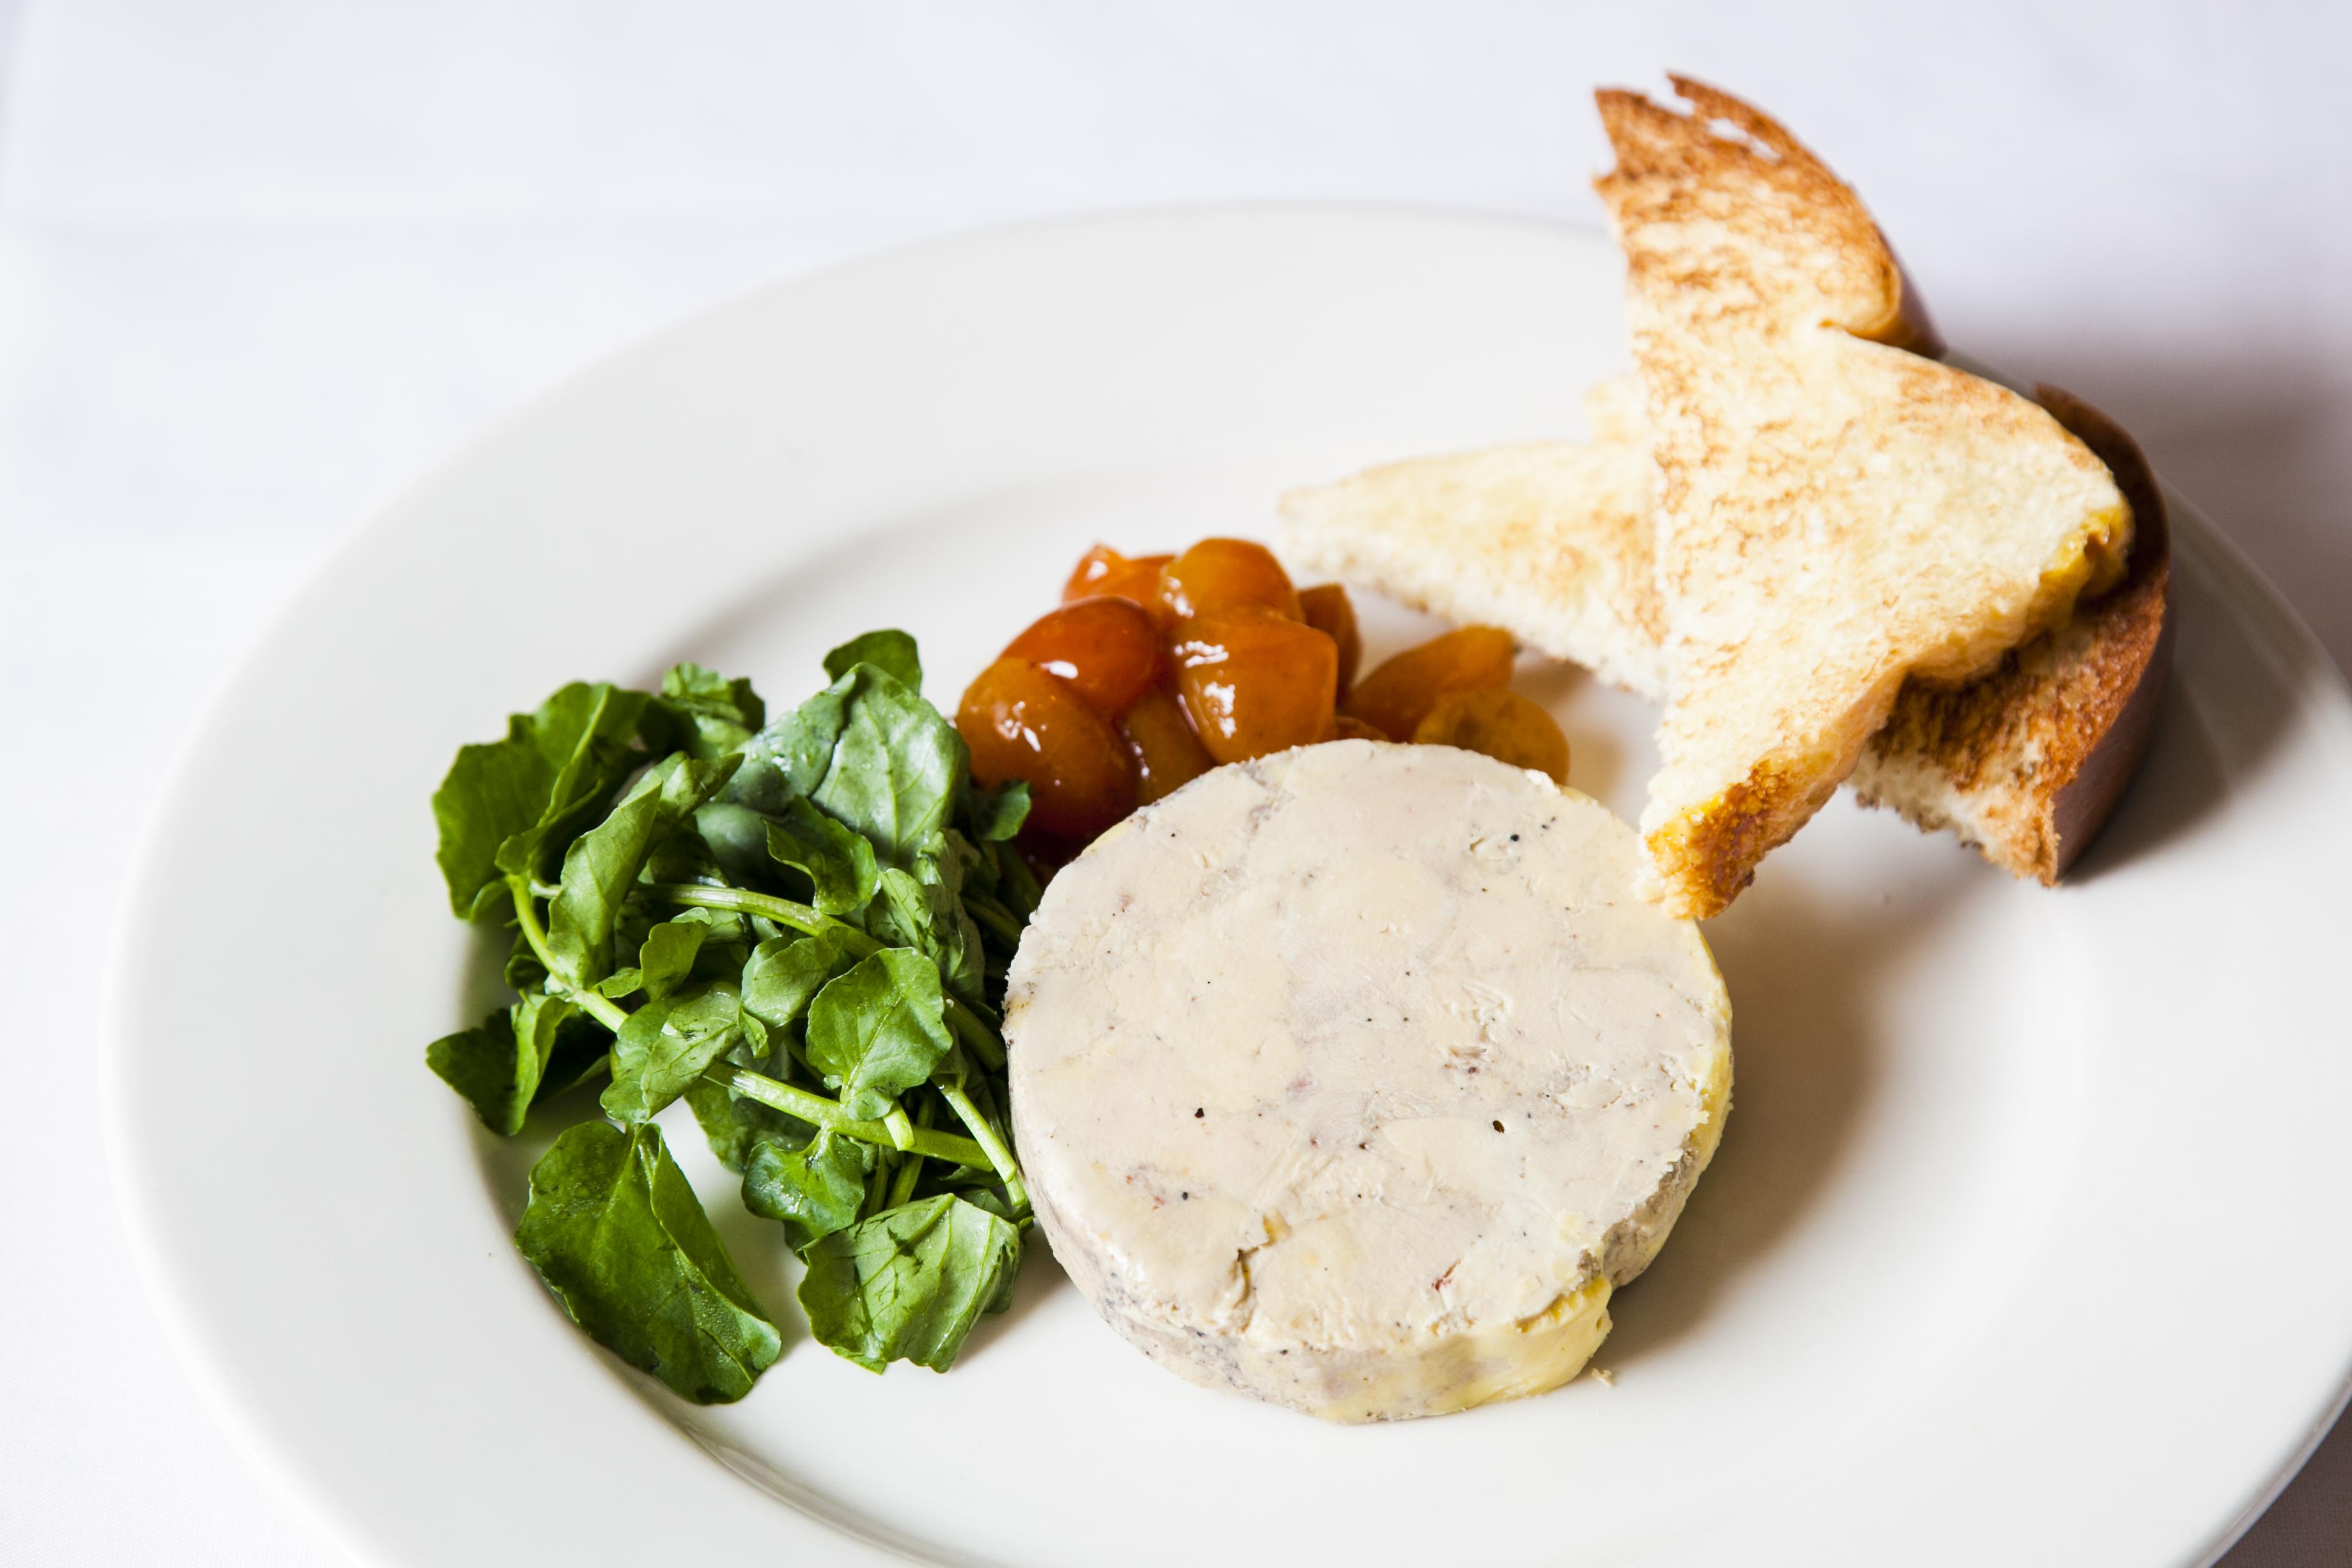 House Made Torchon of Foie Gras. (Samira Bouaou/Epoch Times)